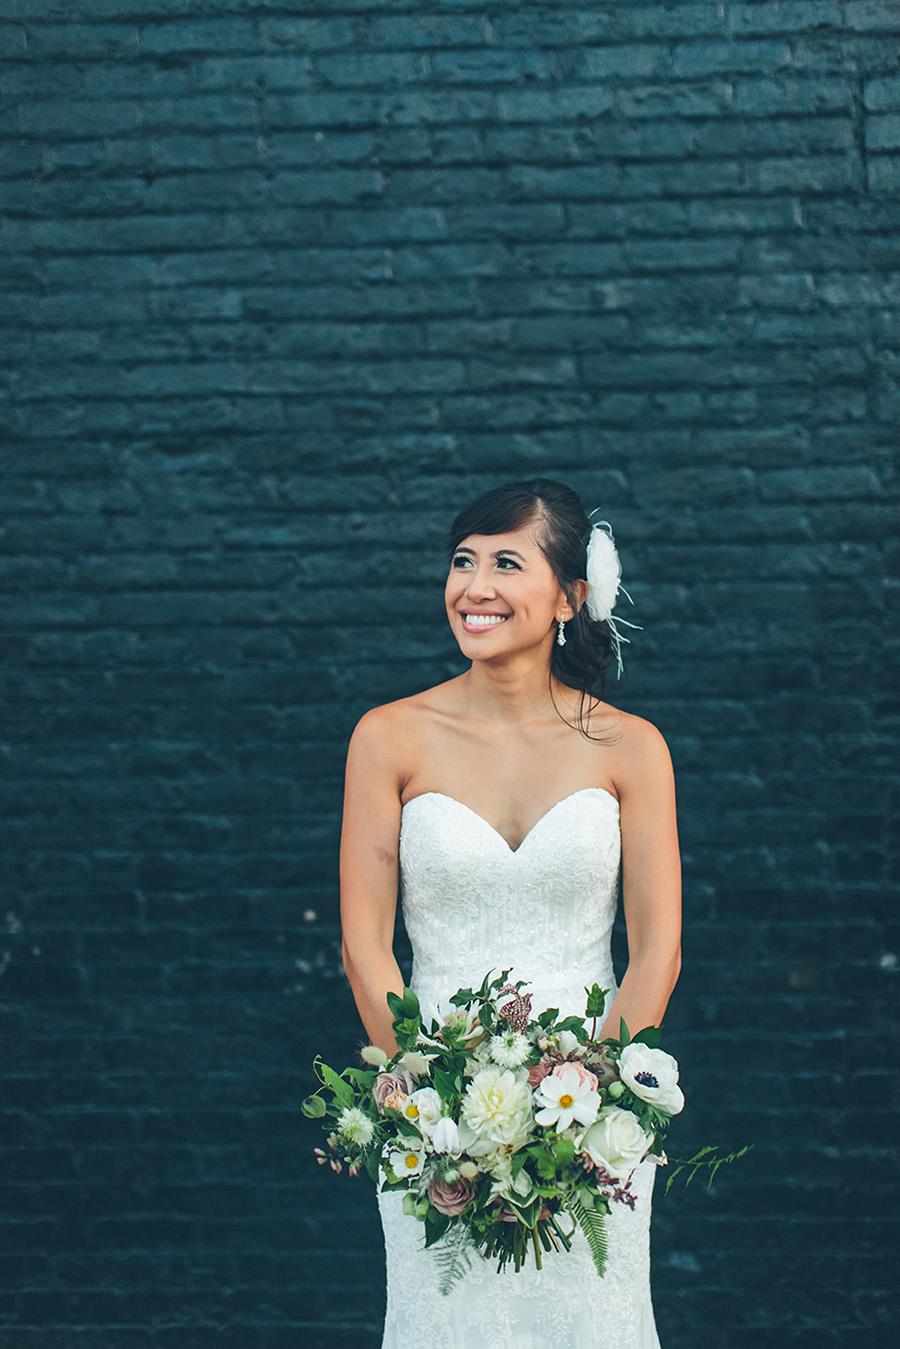 NYC-WEDDING-PHOTOGRAPHER-CITYHALL-ELOPEMENT-501-UNION-BROOKLYN-WEDDING-JILL-JUSTIN0017.jpg